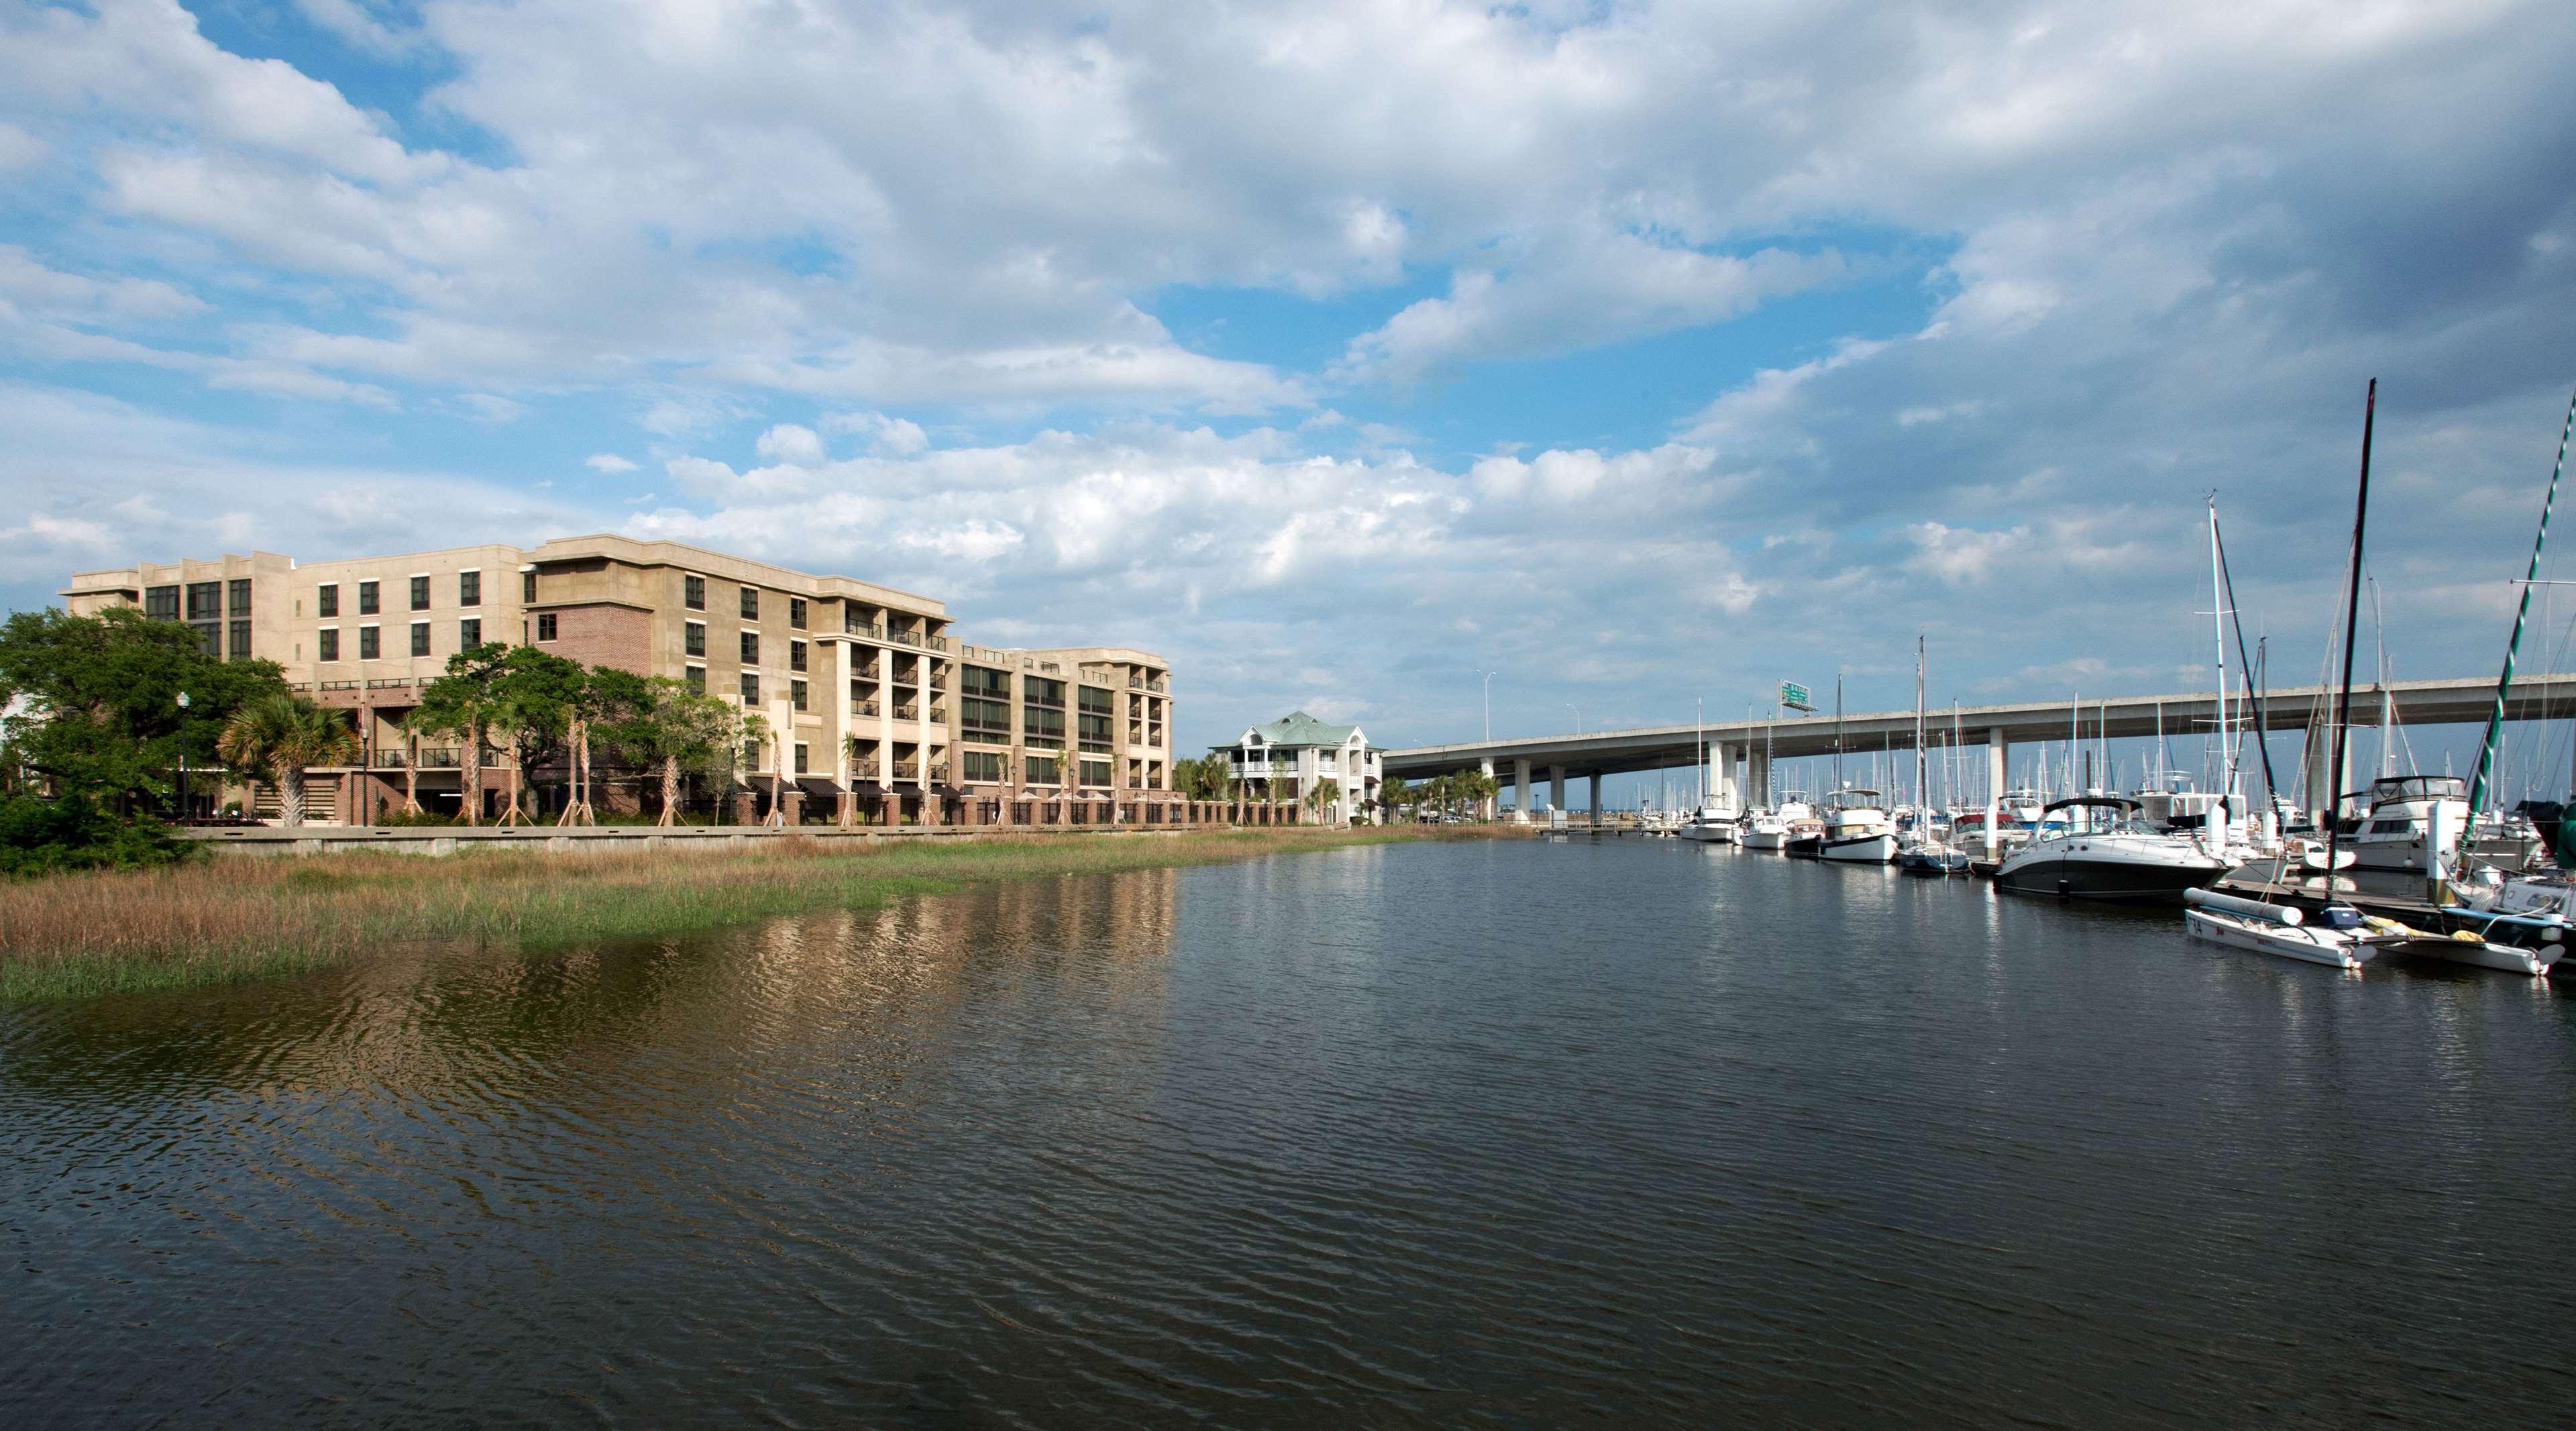 Hilton Garden Inn Charleston Waterfront/Downtown image 2